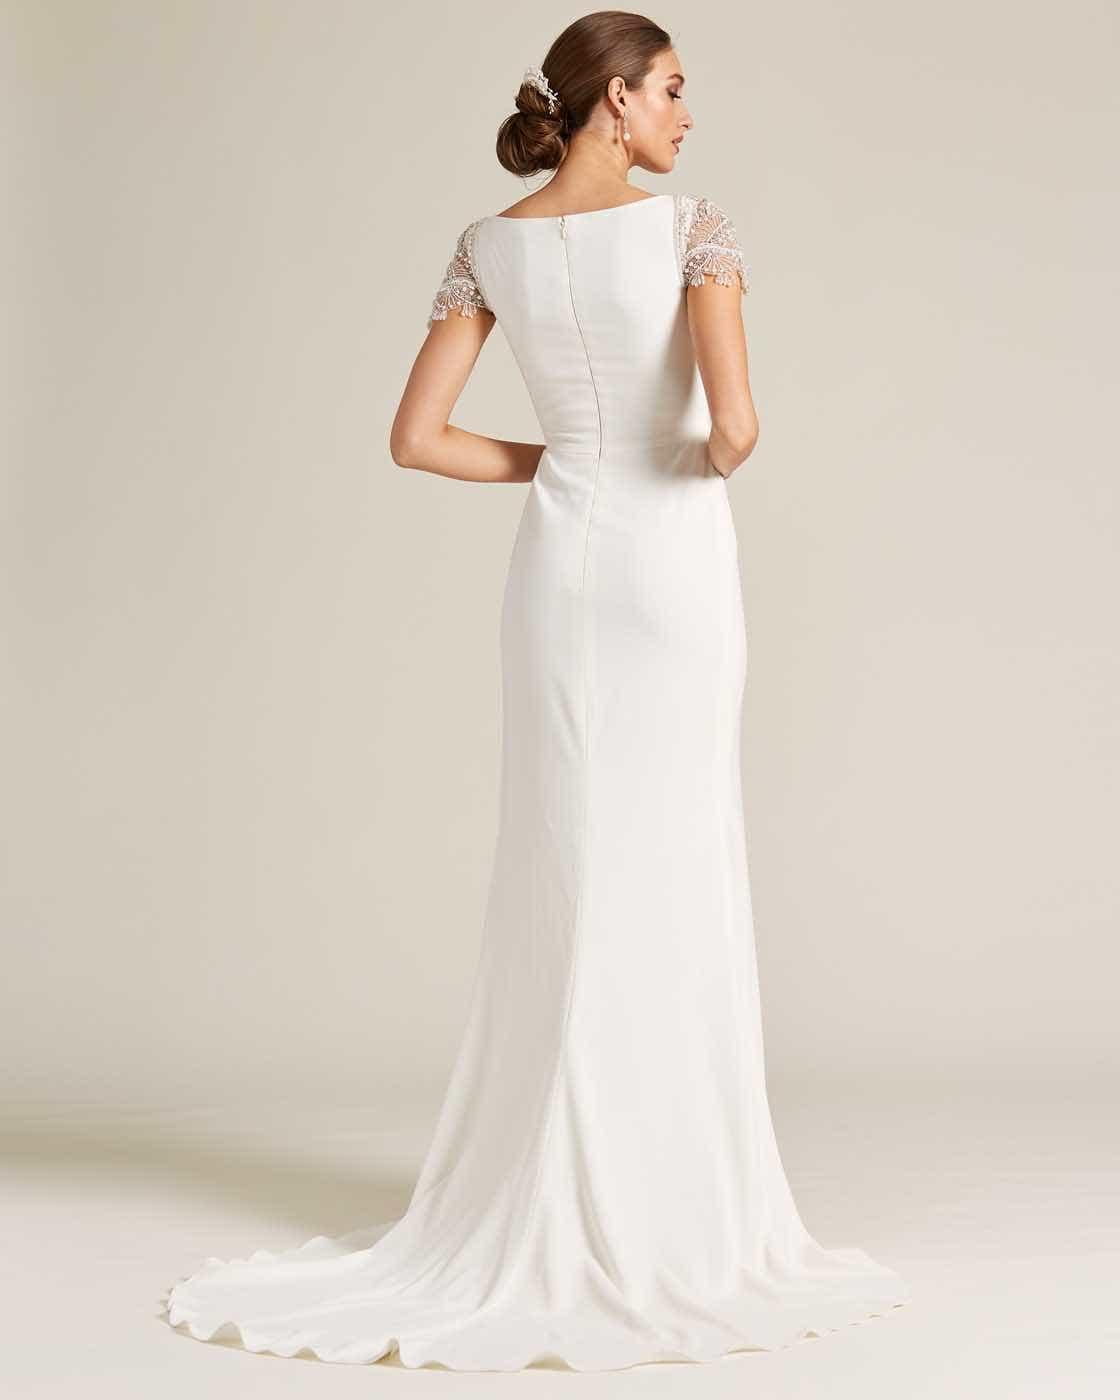 White Embroidered Cap Sleeve Wedding Dress - Back